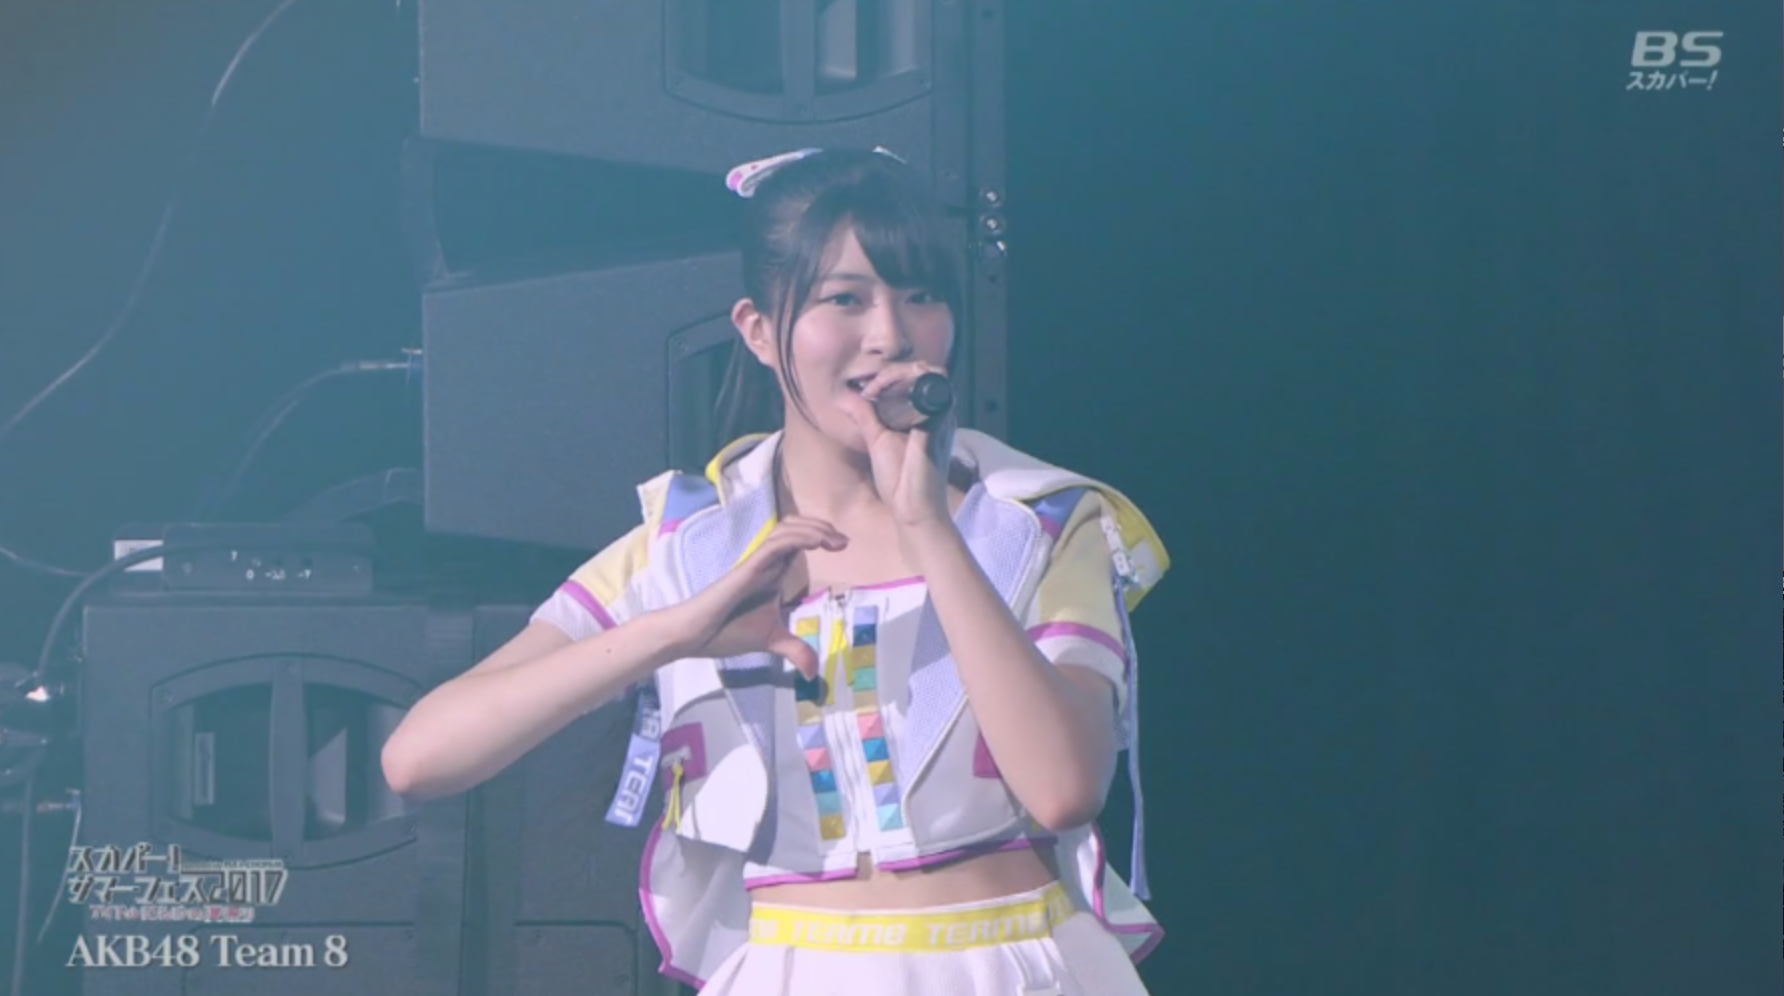 【AKB48チーム8】行天優莉奈 応援スレ5【香川県】©2ch.netYouTube動画>46本 ->画像>555枚